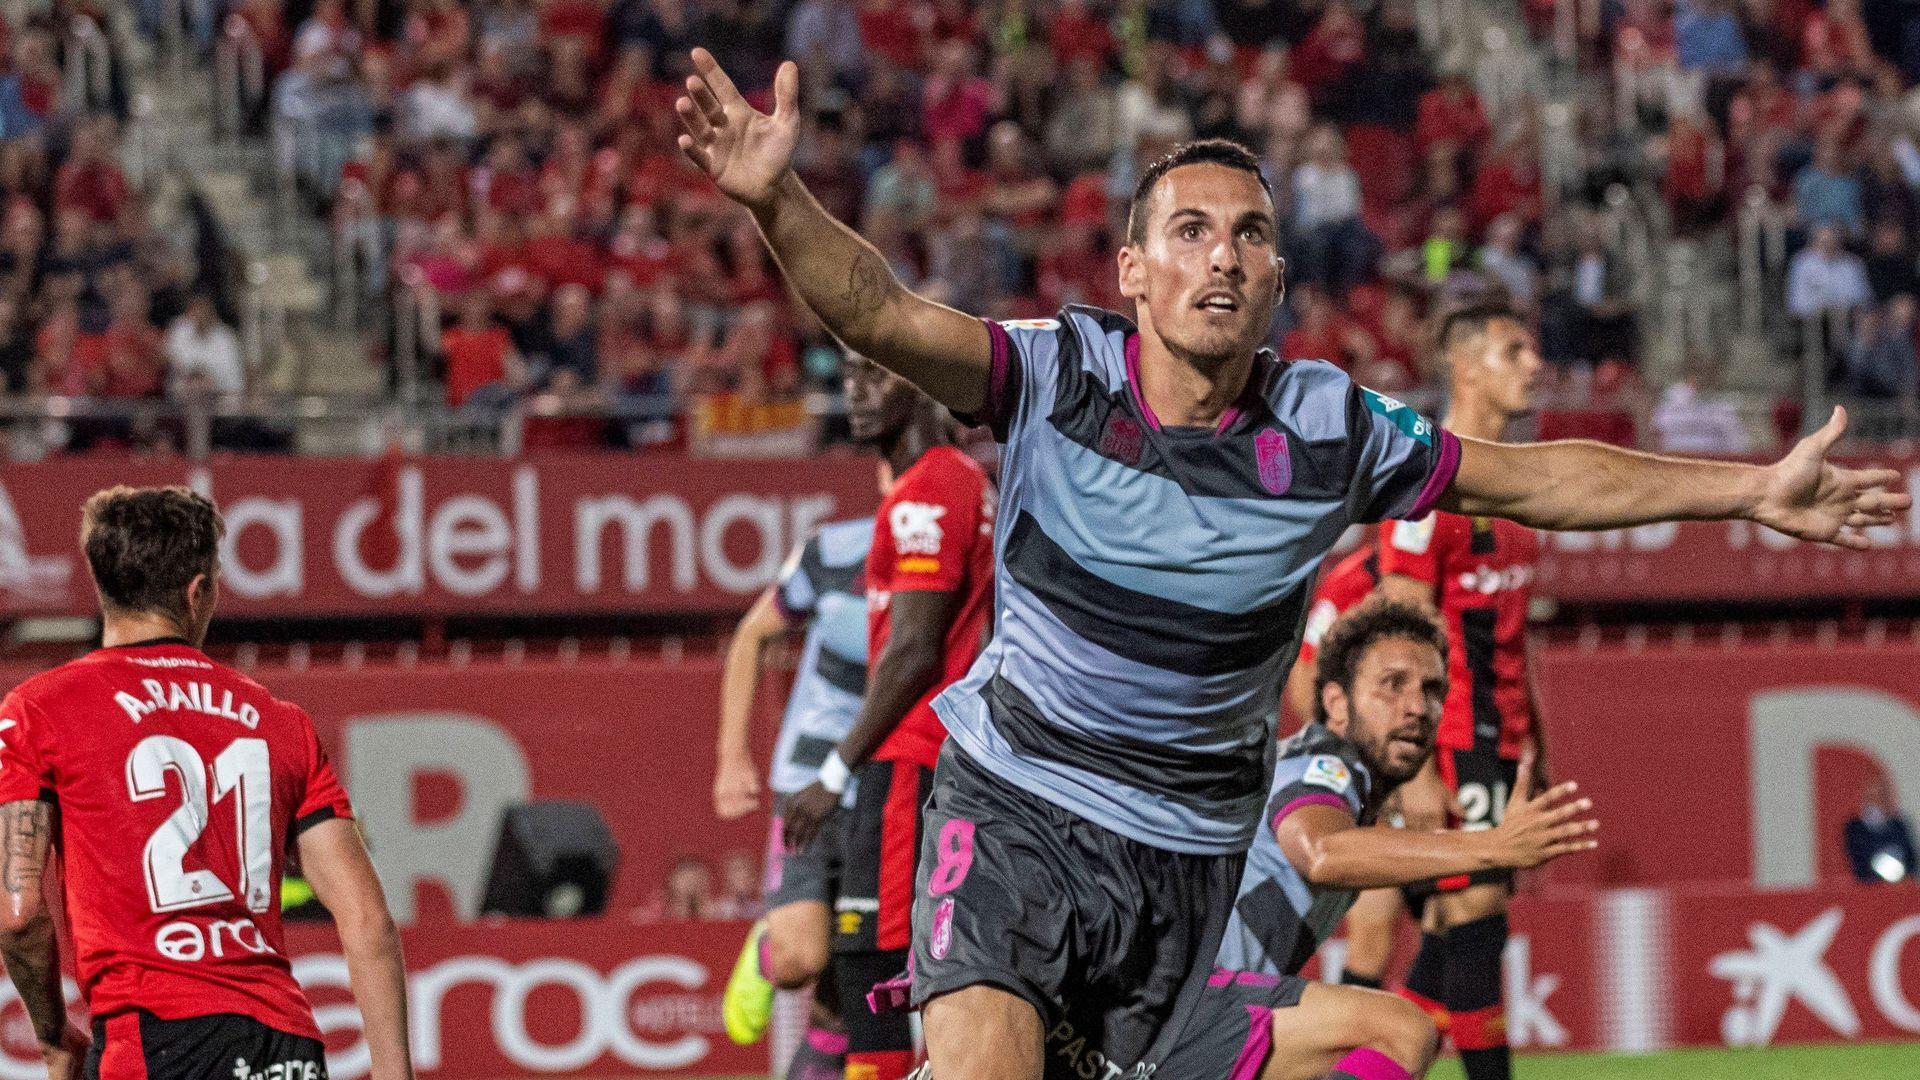 El Granada regresa a Primera y el Rayo Majadahonda baja a Segunda B ...